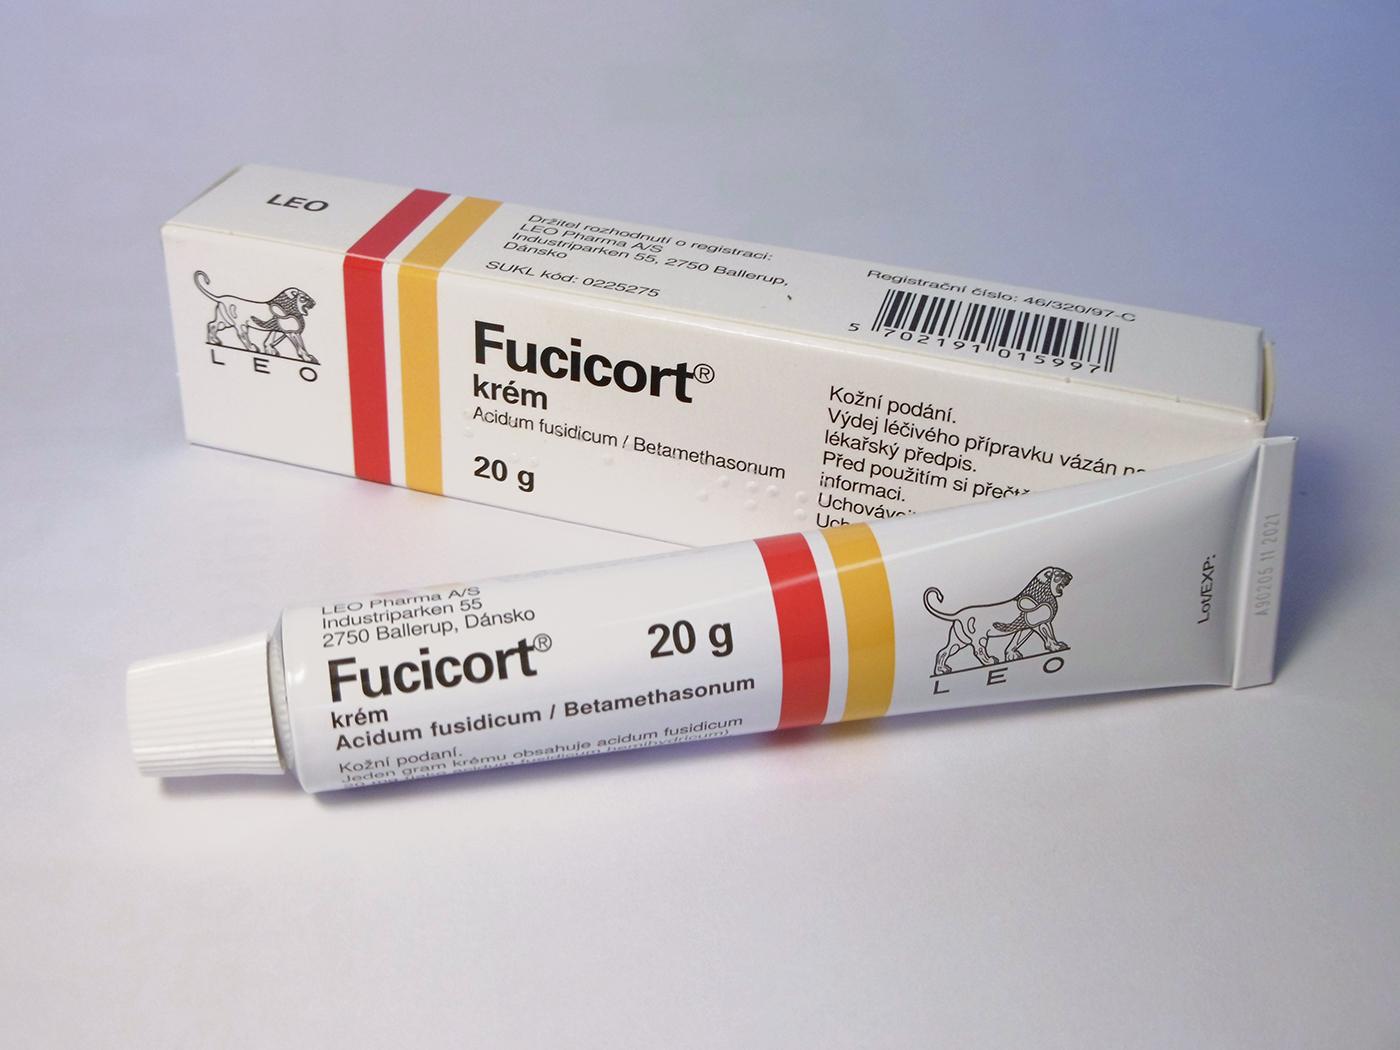 File:Fucicort 20 g crm.jpg - Wikimedia Commons